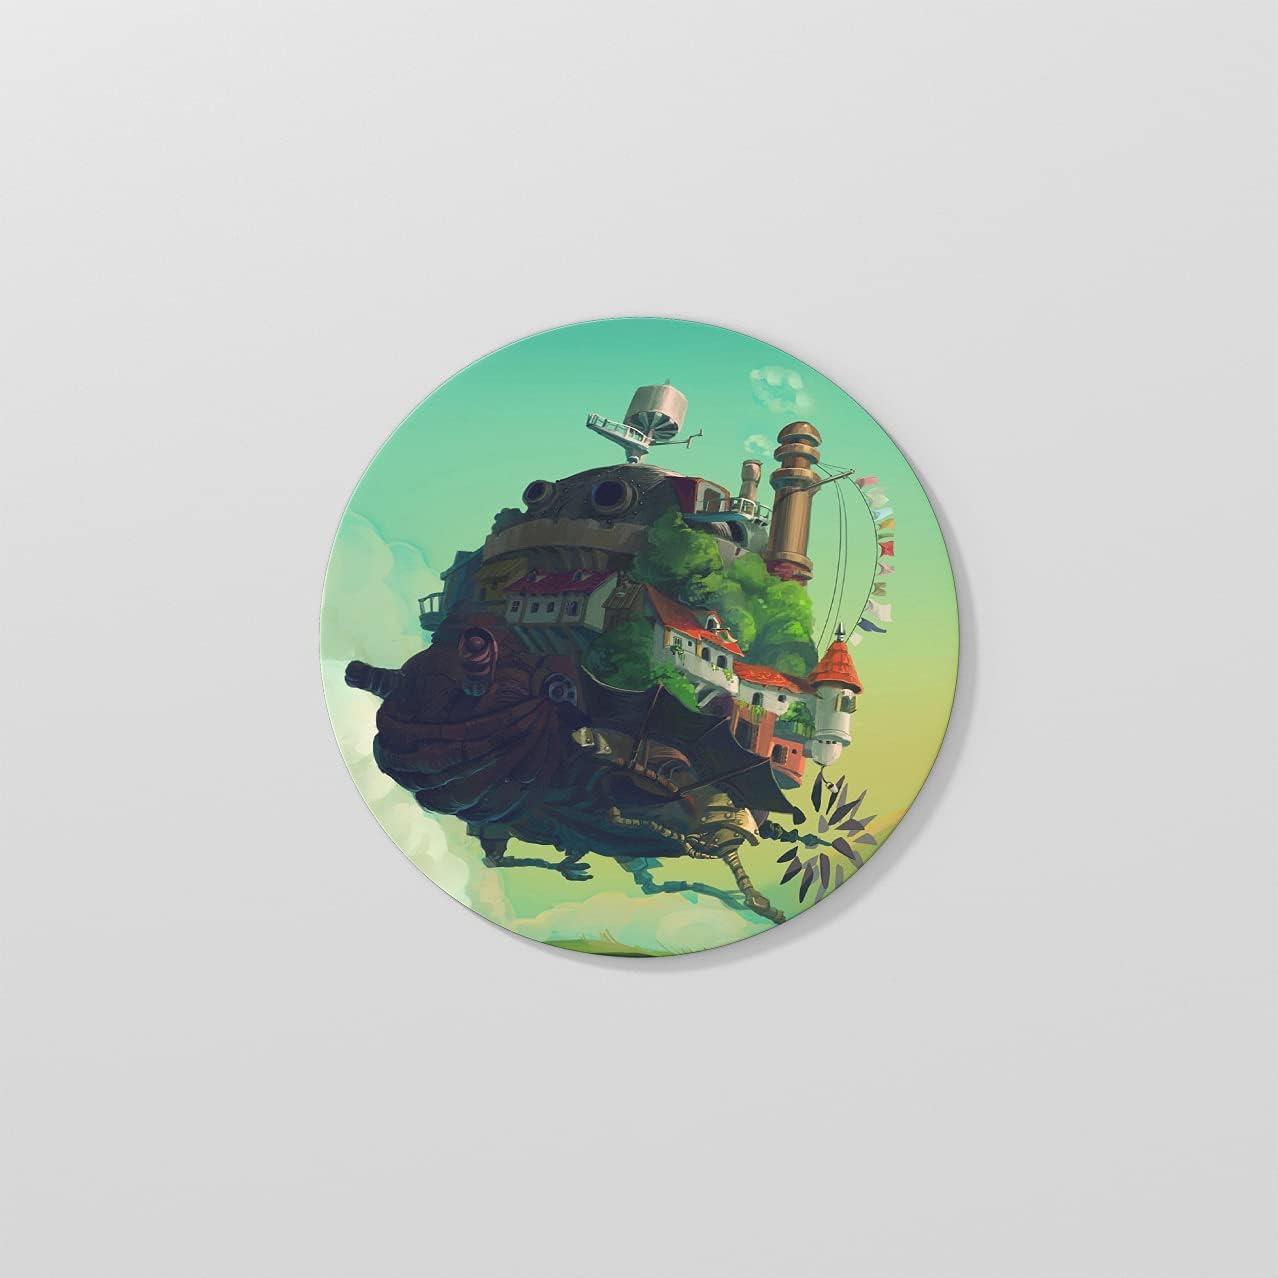 10cm Diameter Round Cork Coaster, Printed with Howl's Moving Castle Hayao Miyazaki Anime Patterns